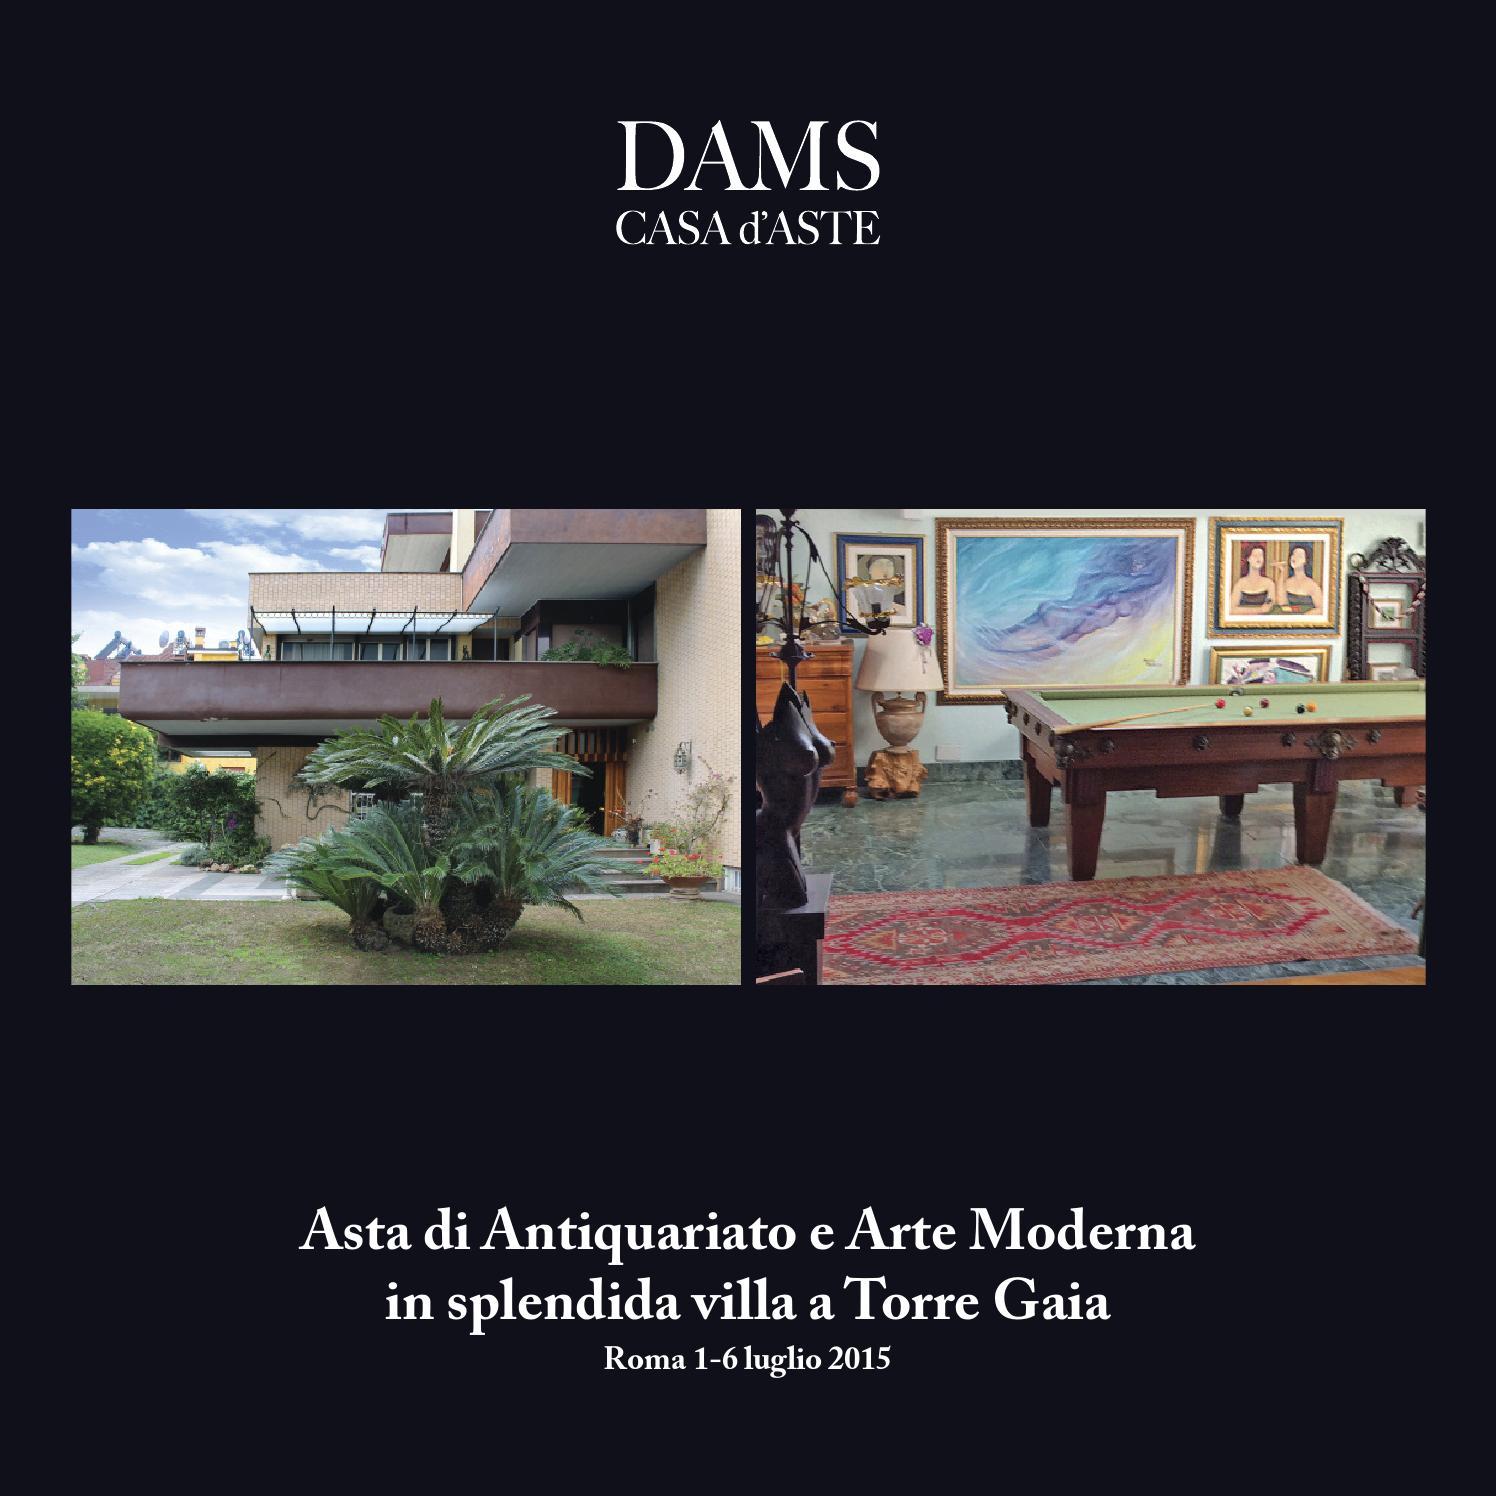 Asta di antiquariato e arte moderna a roma 1 6 luglio 2015 by dams casa aste issuu - Aste arredamento casa ...